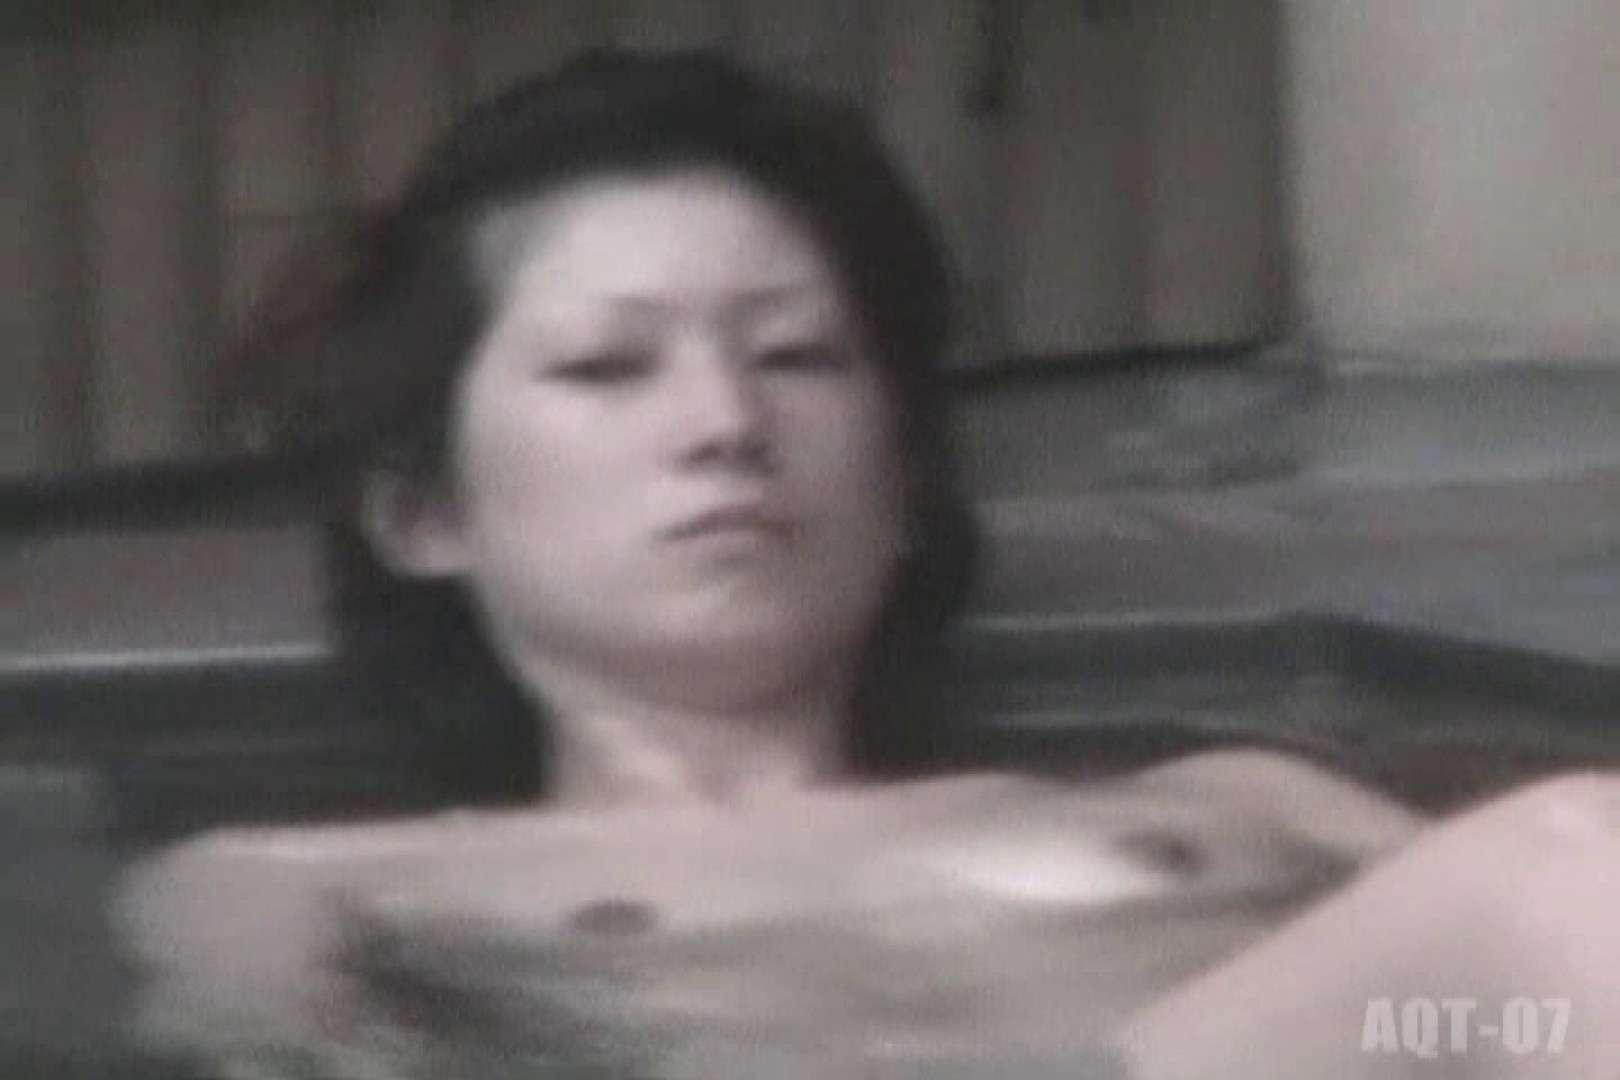 Aquaな露天風呂Vol.766 OL女体  51連発 9